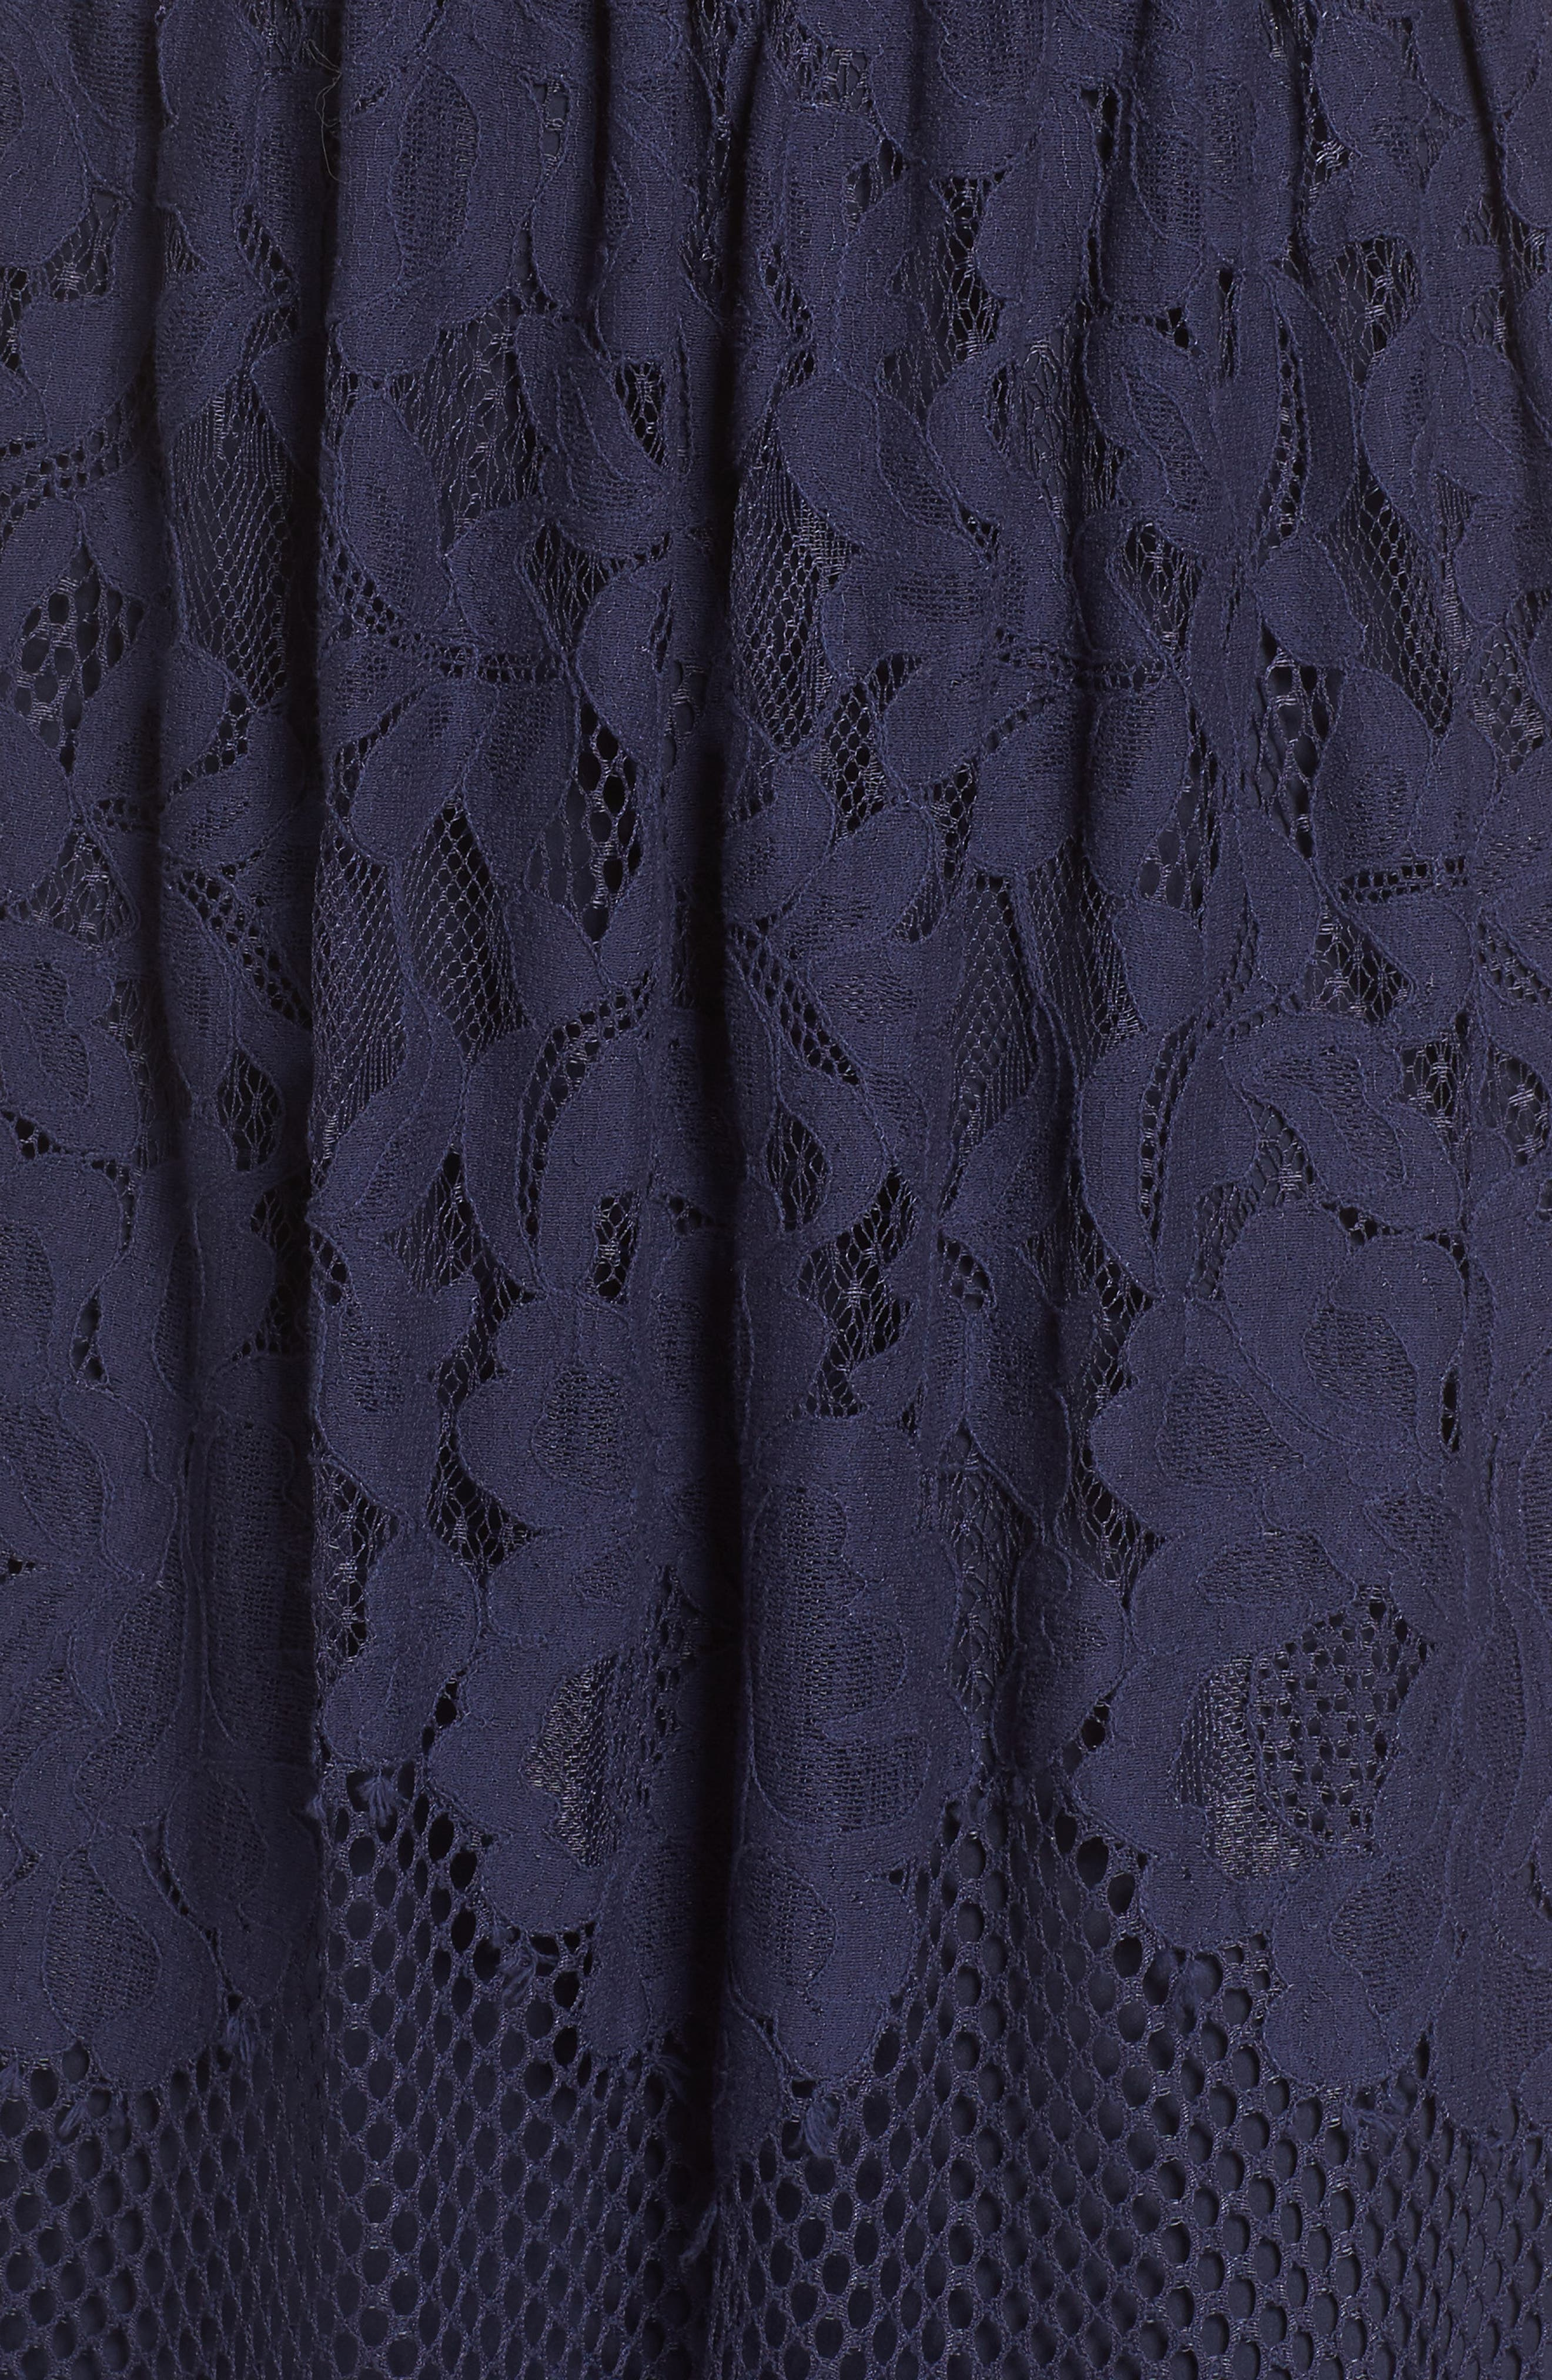 Off the Shoulder Lace Midi Dress,                             Alternate thumbnail 5, color,                             410